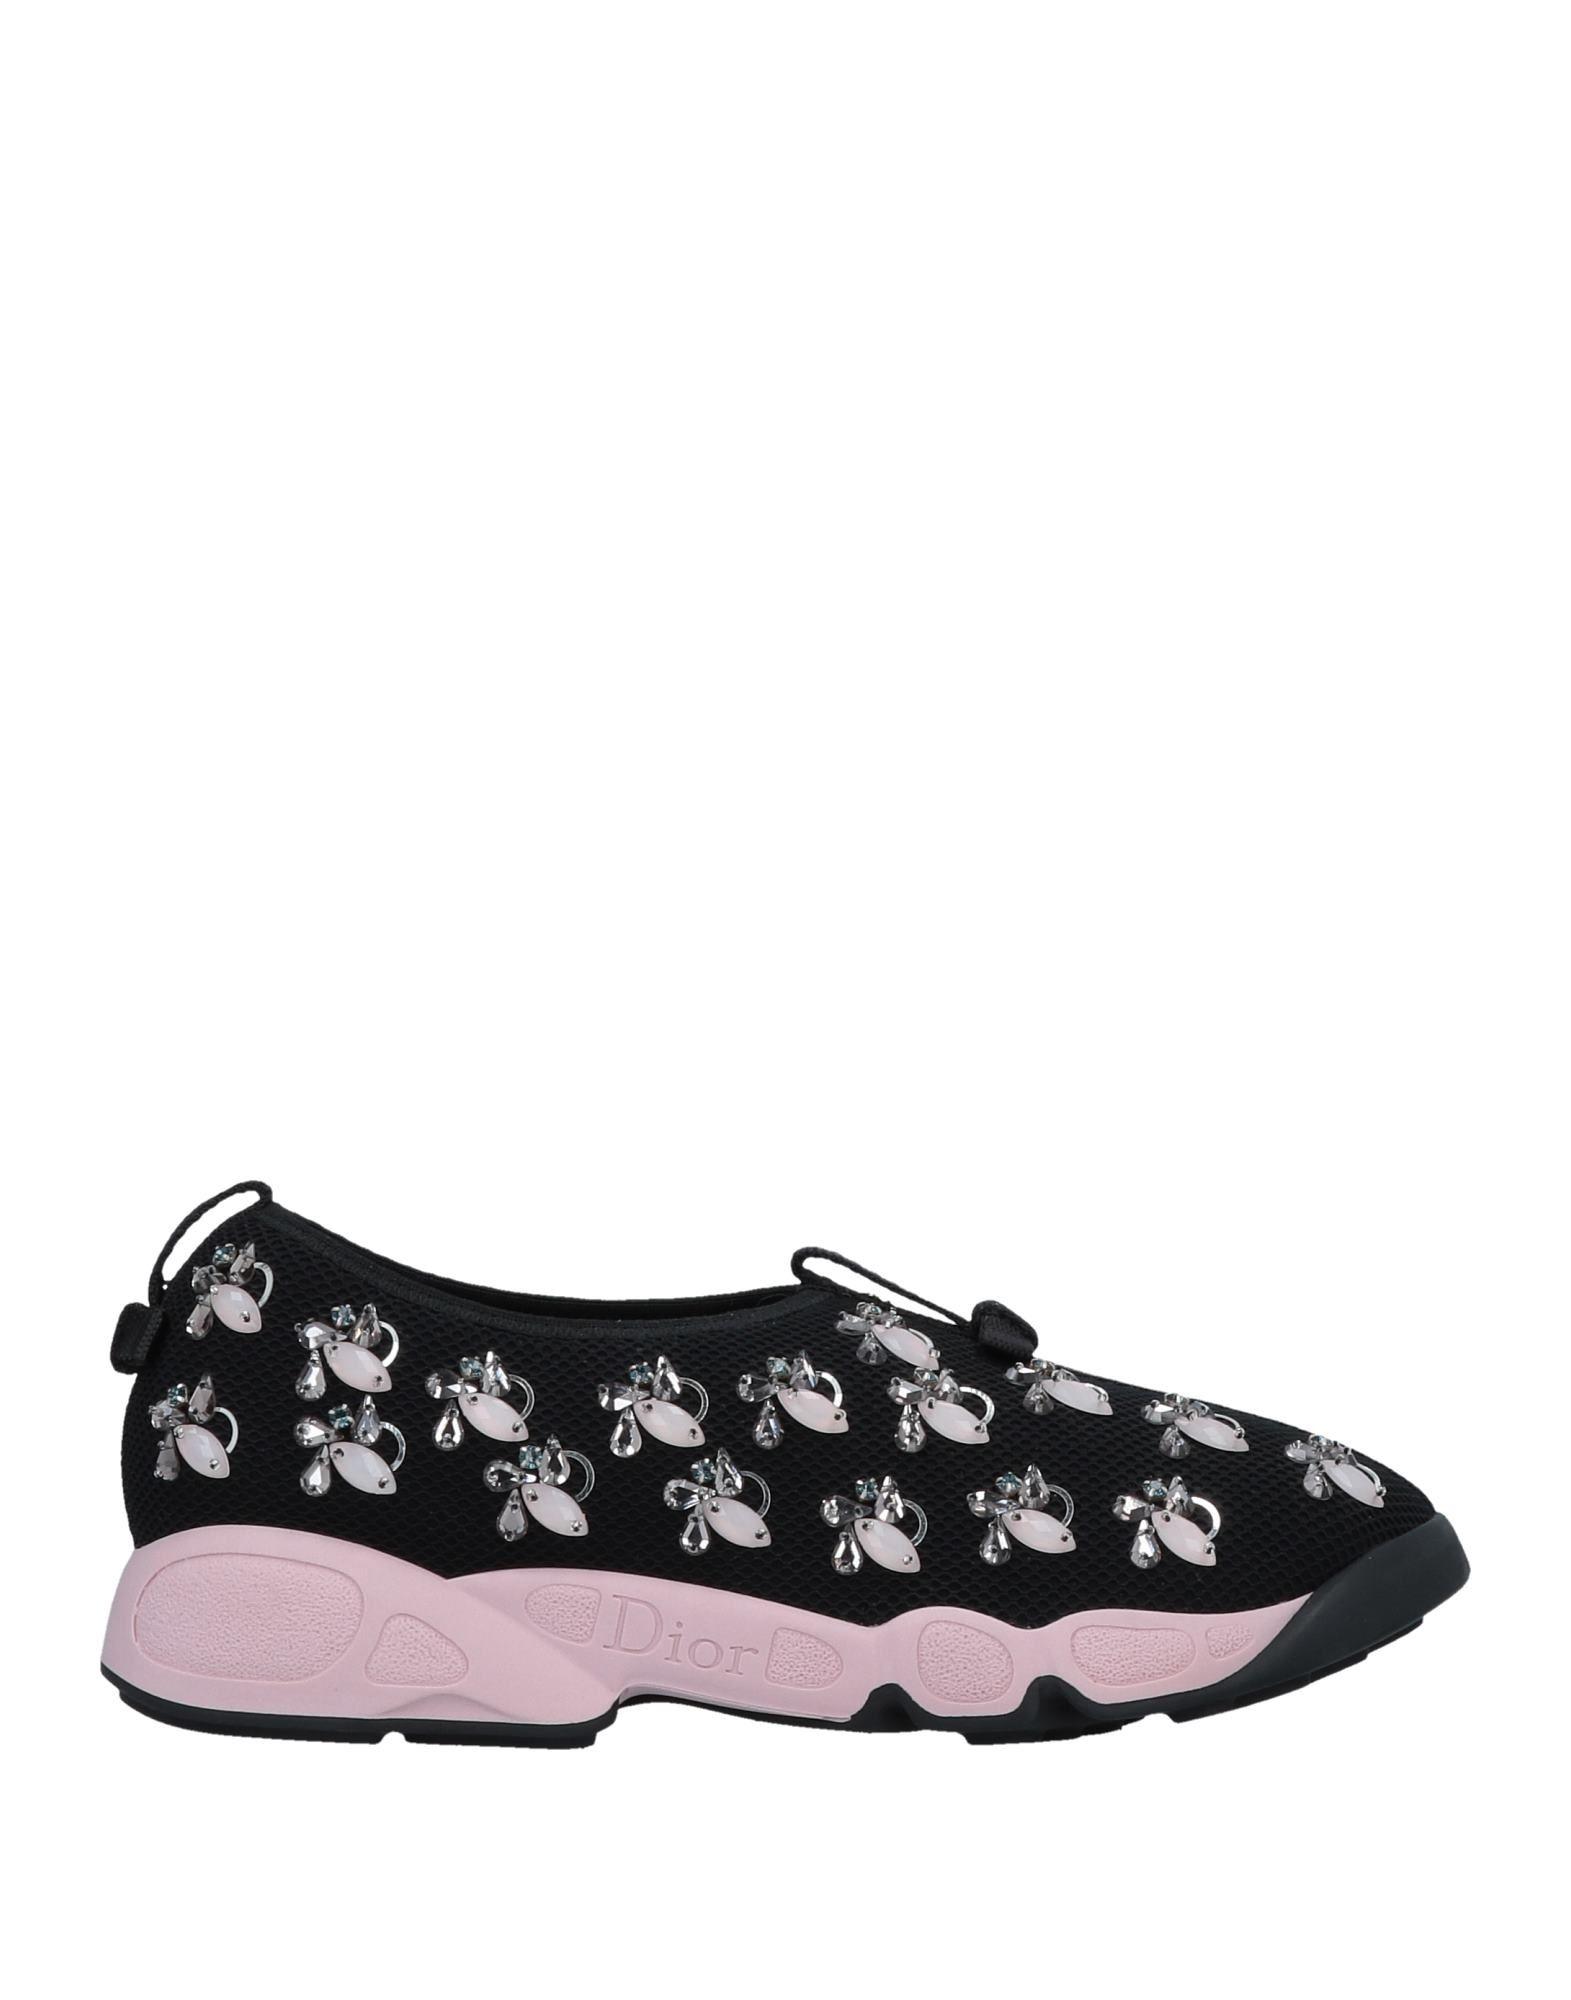 Haltbare Mode billige Schuhe Dior Sneakers Damen  11503234PH Heiße Schuhe